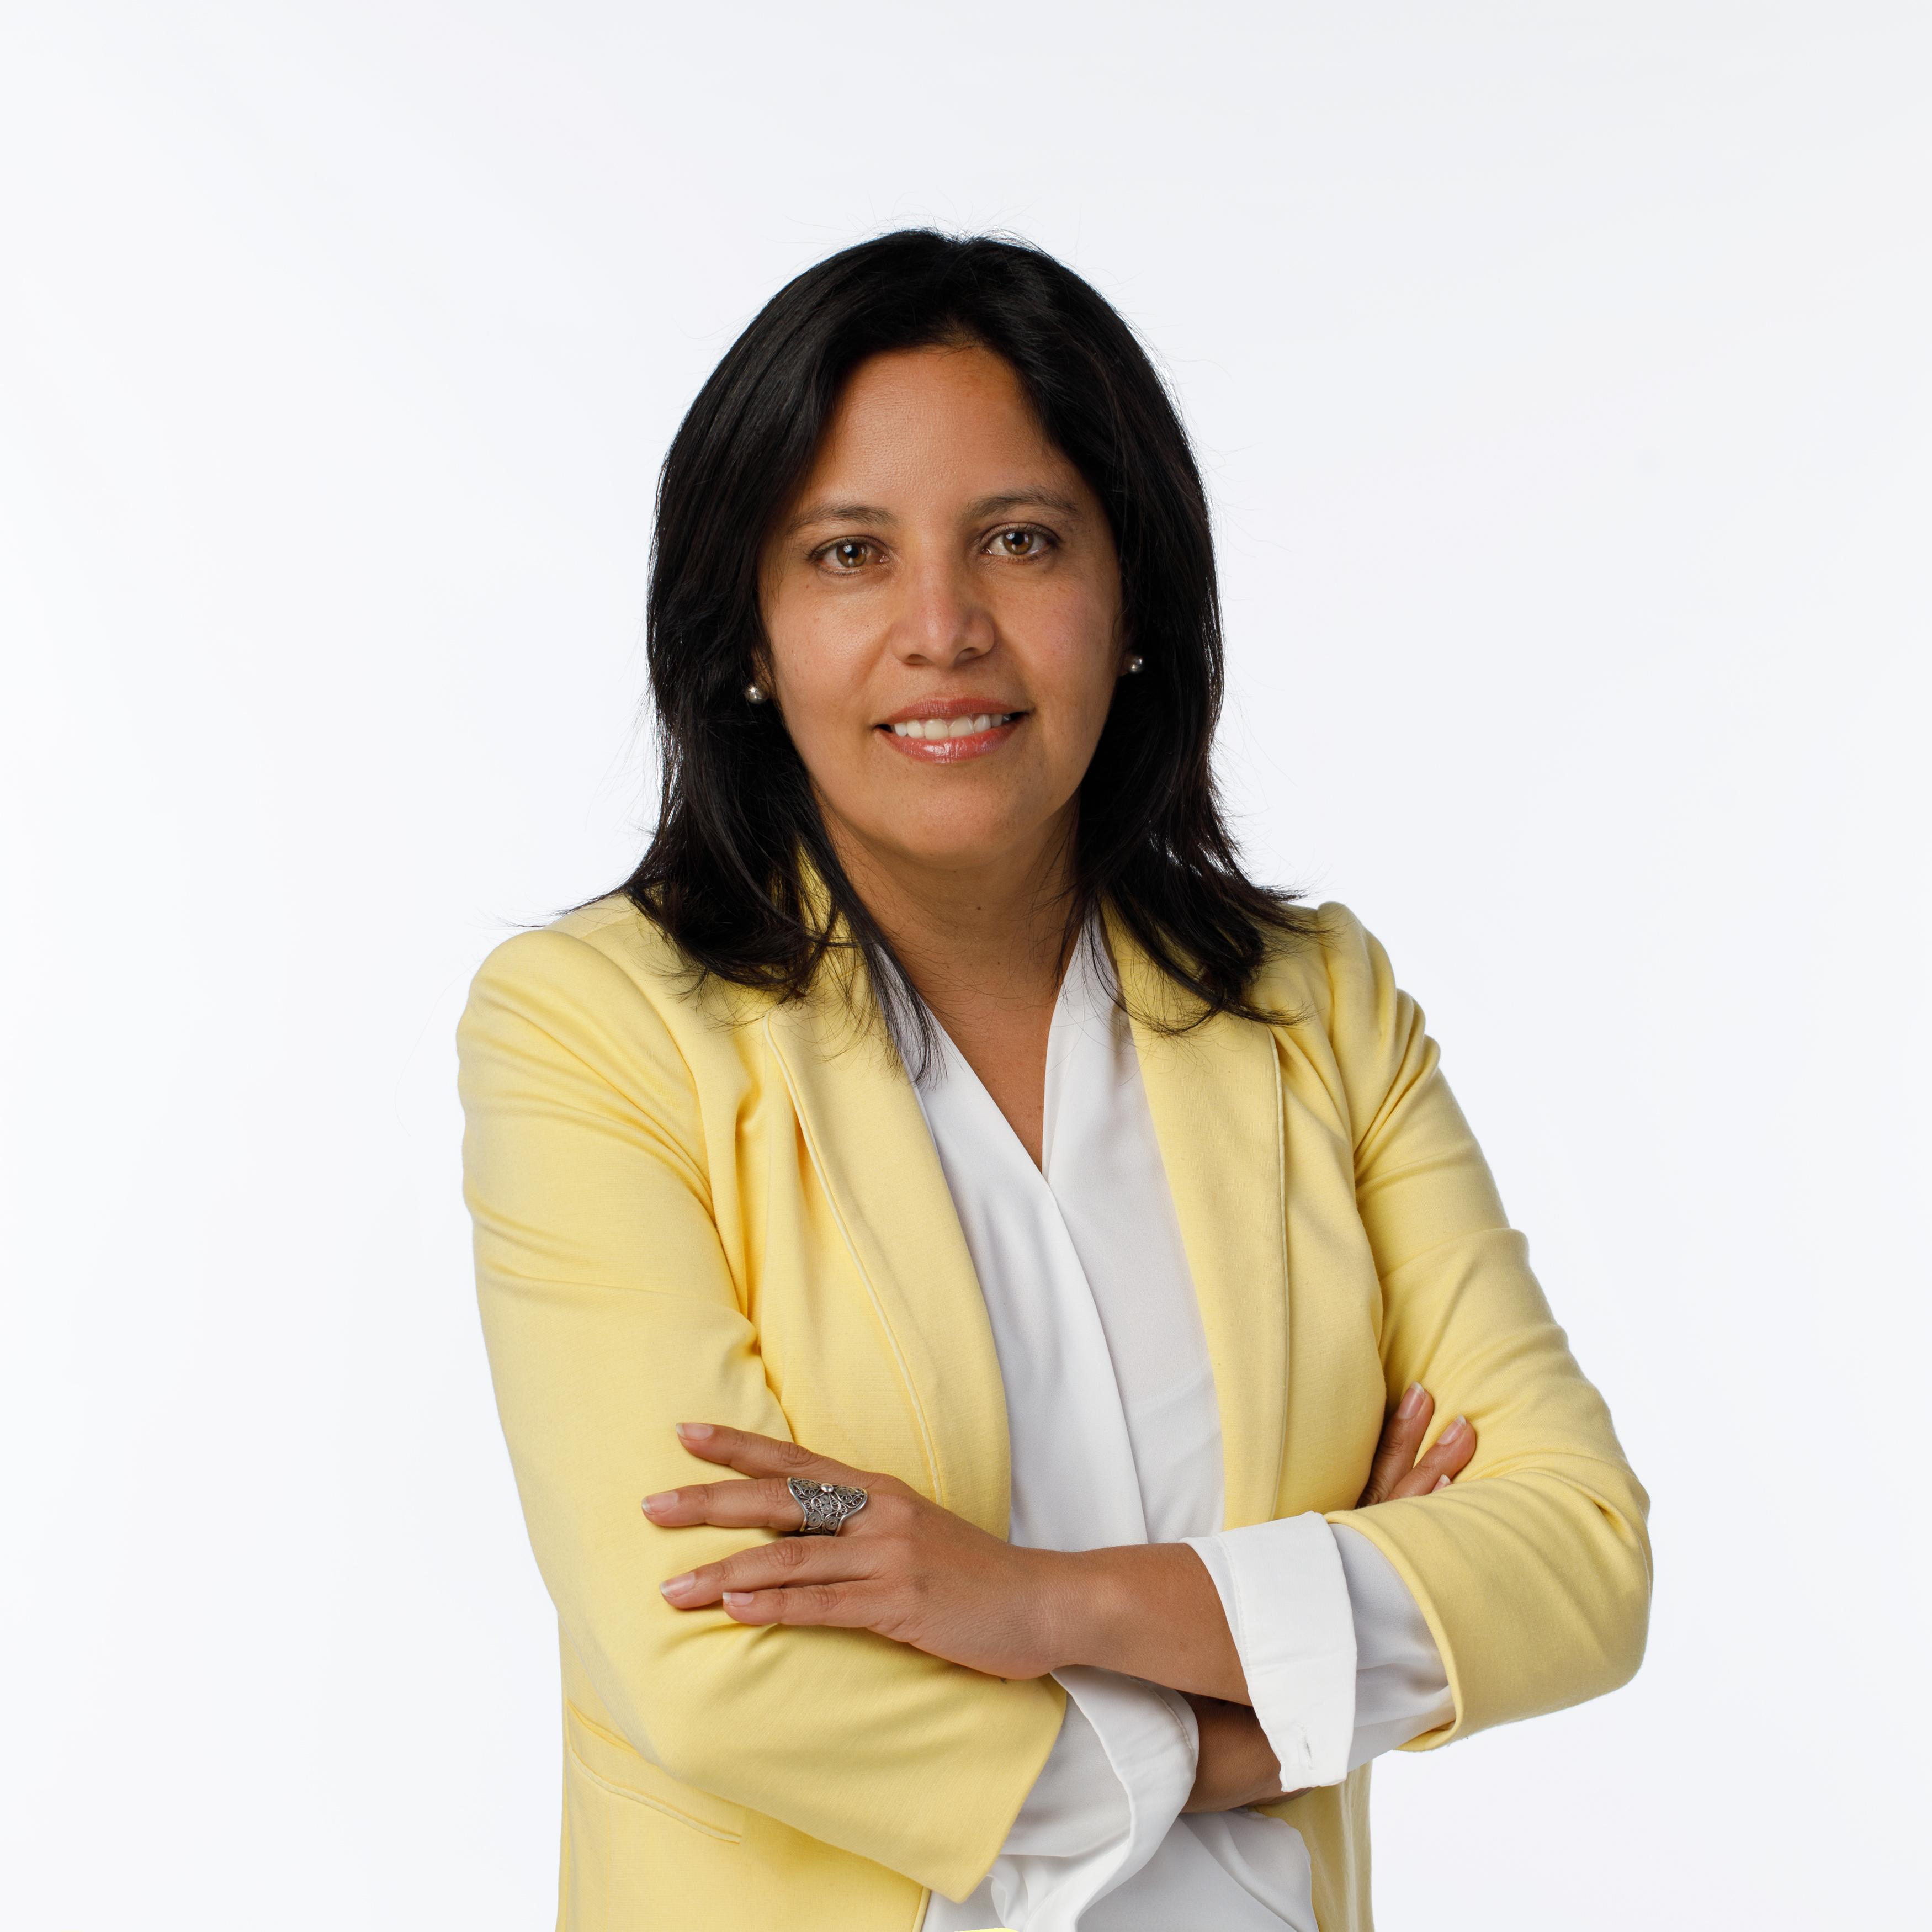 Karima Wanuz